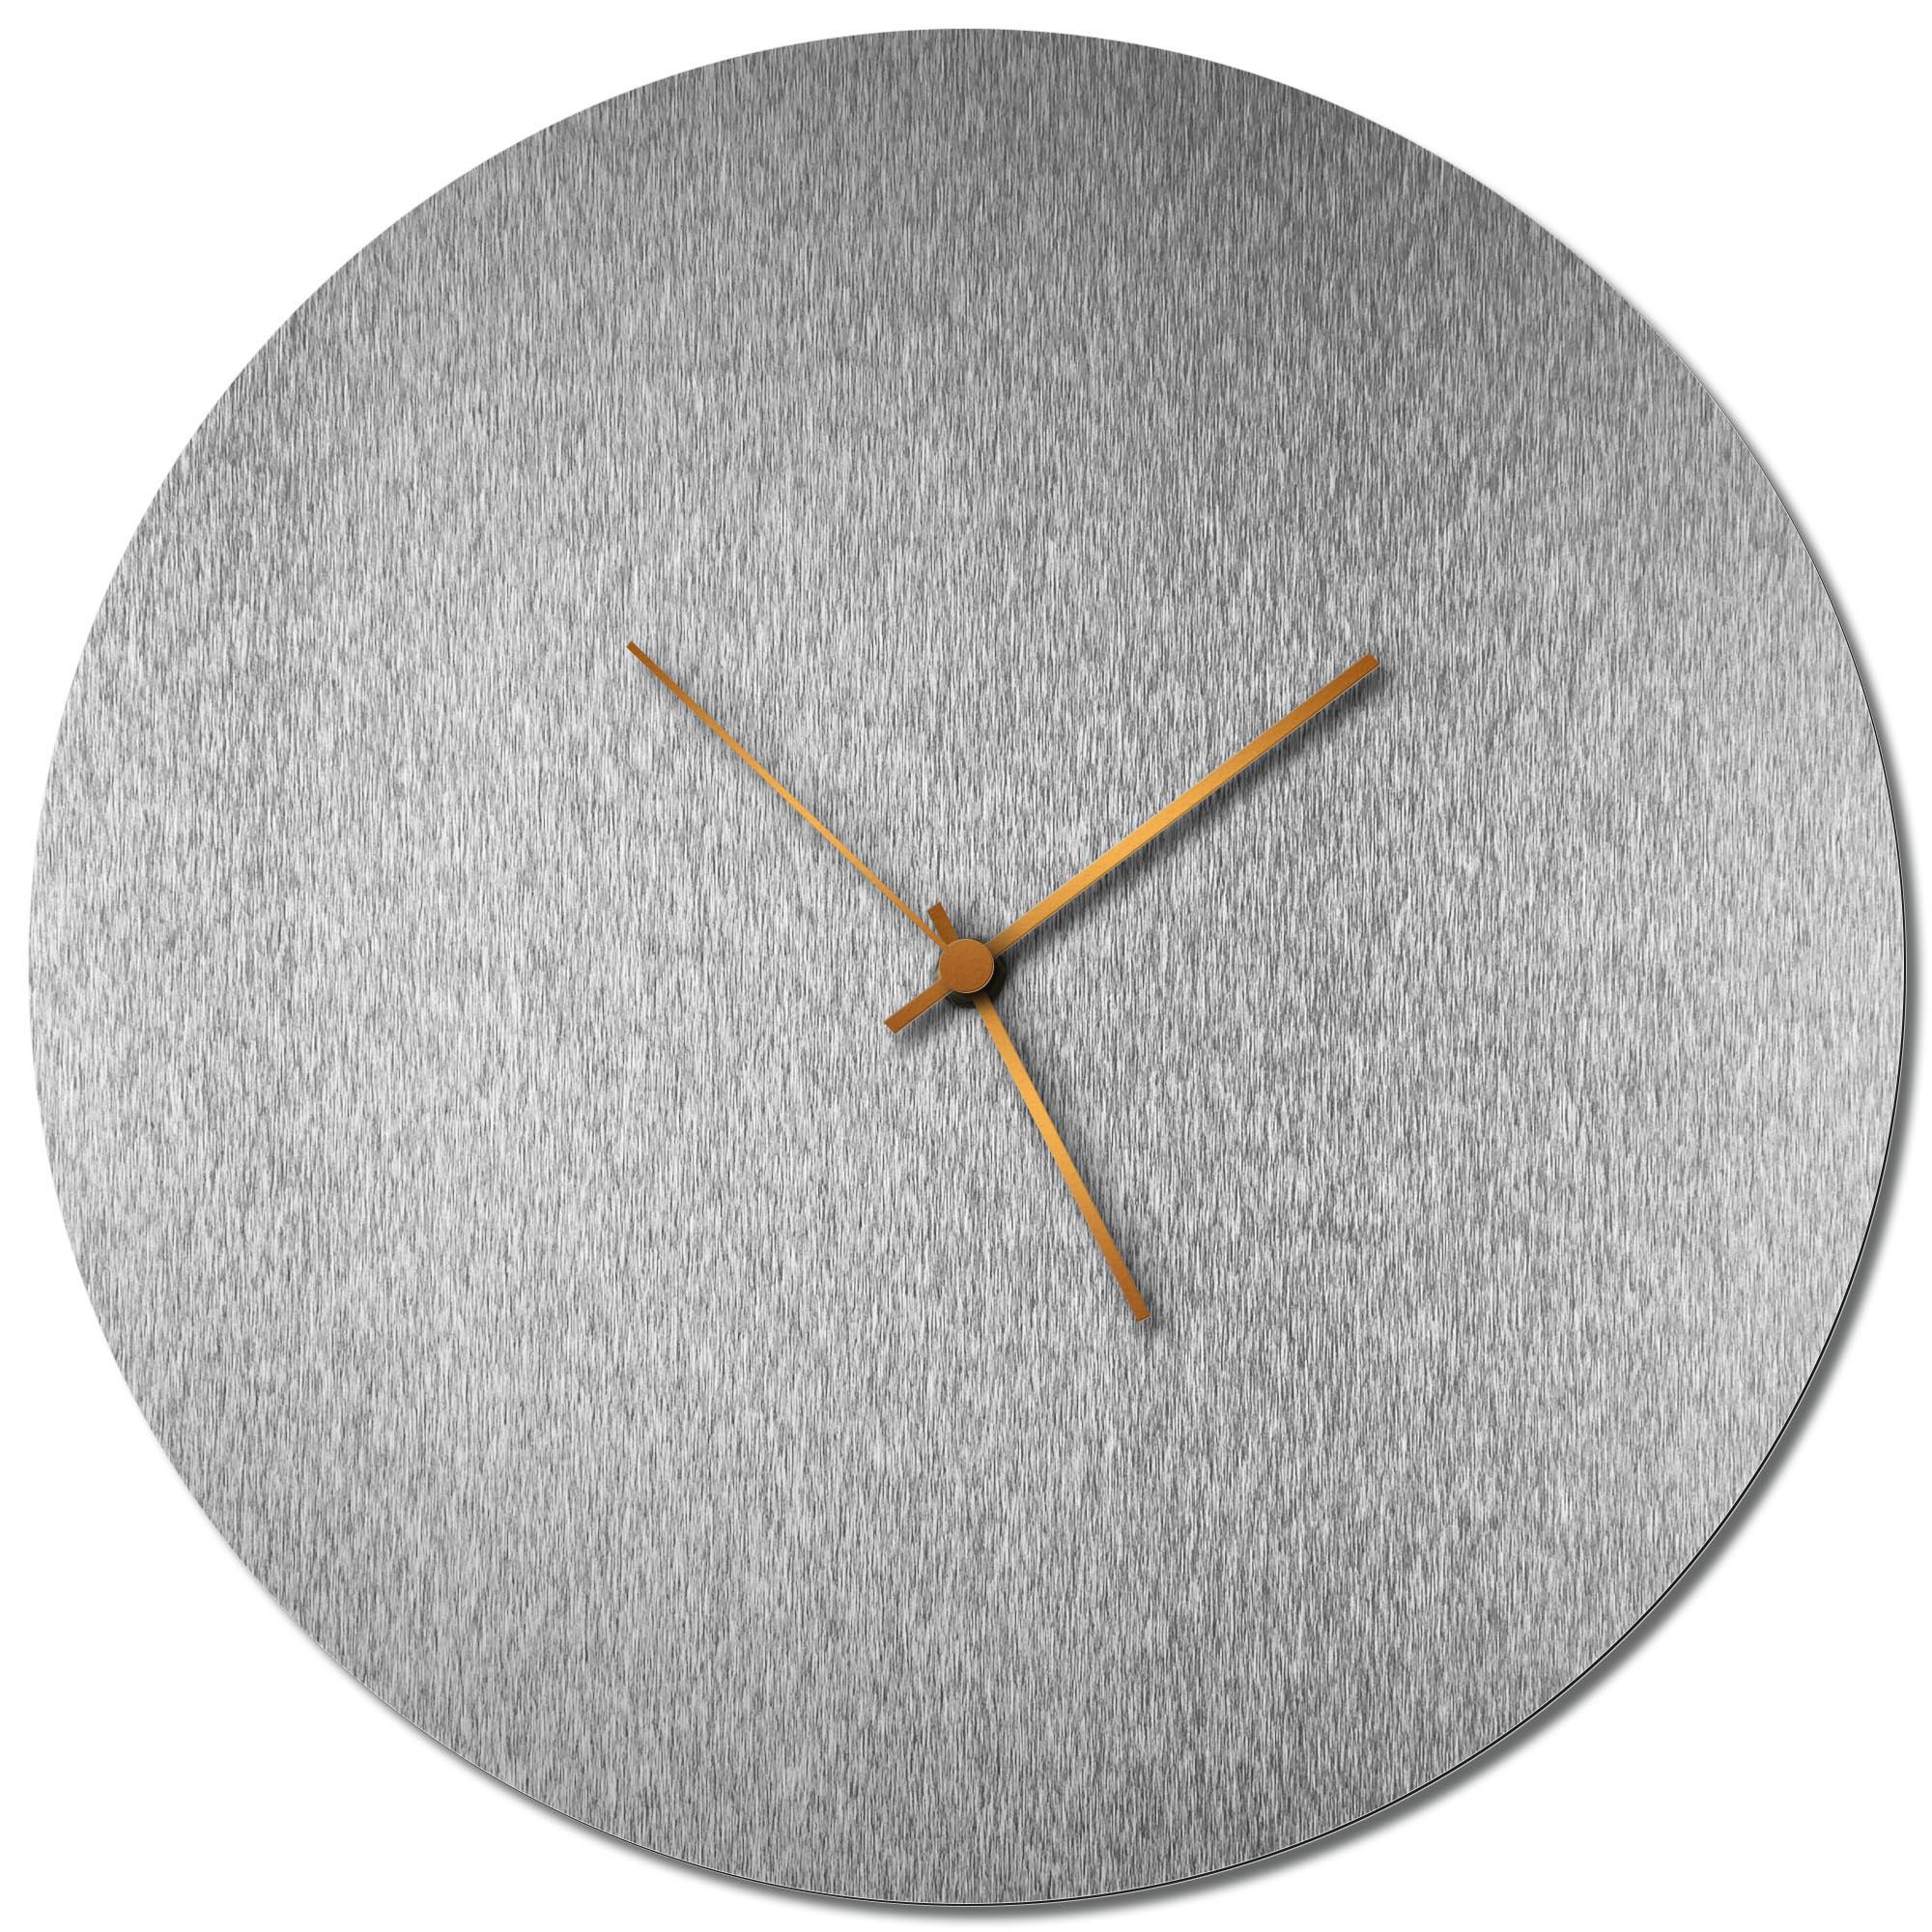 Adam Schwoeppe 'Silversmith Circle Clock Bronze' Midcentury Modern Style Wall Clock